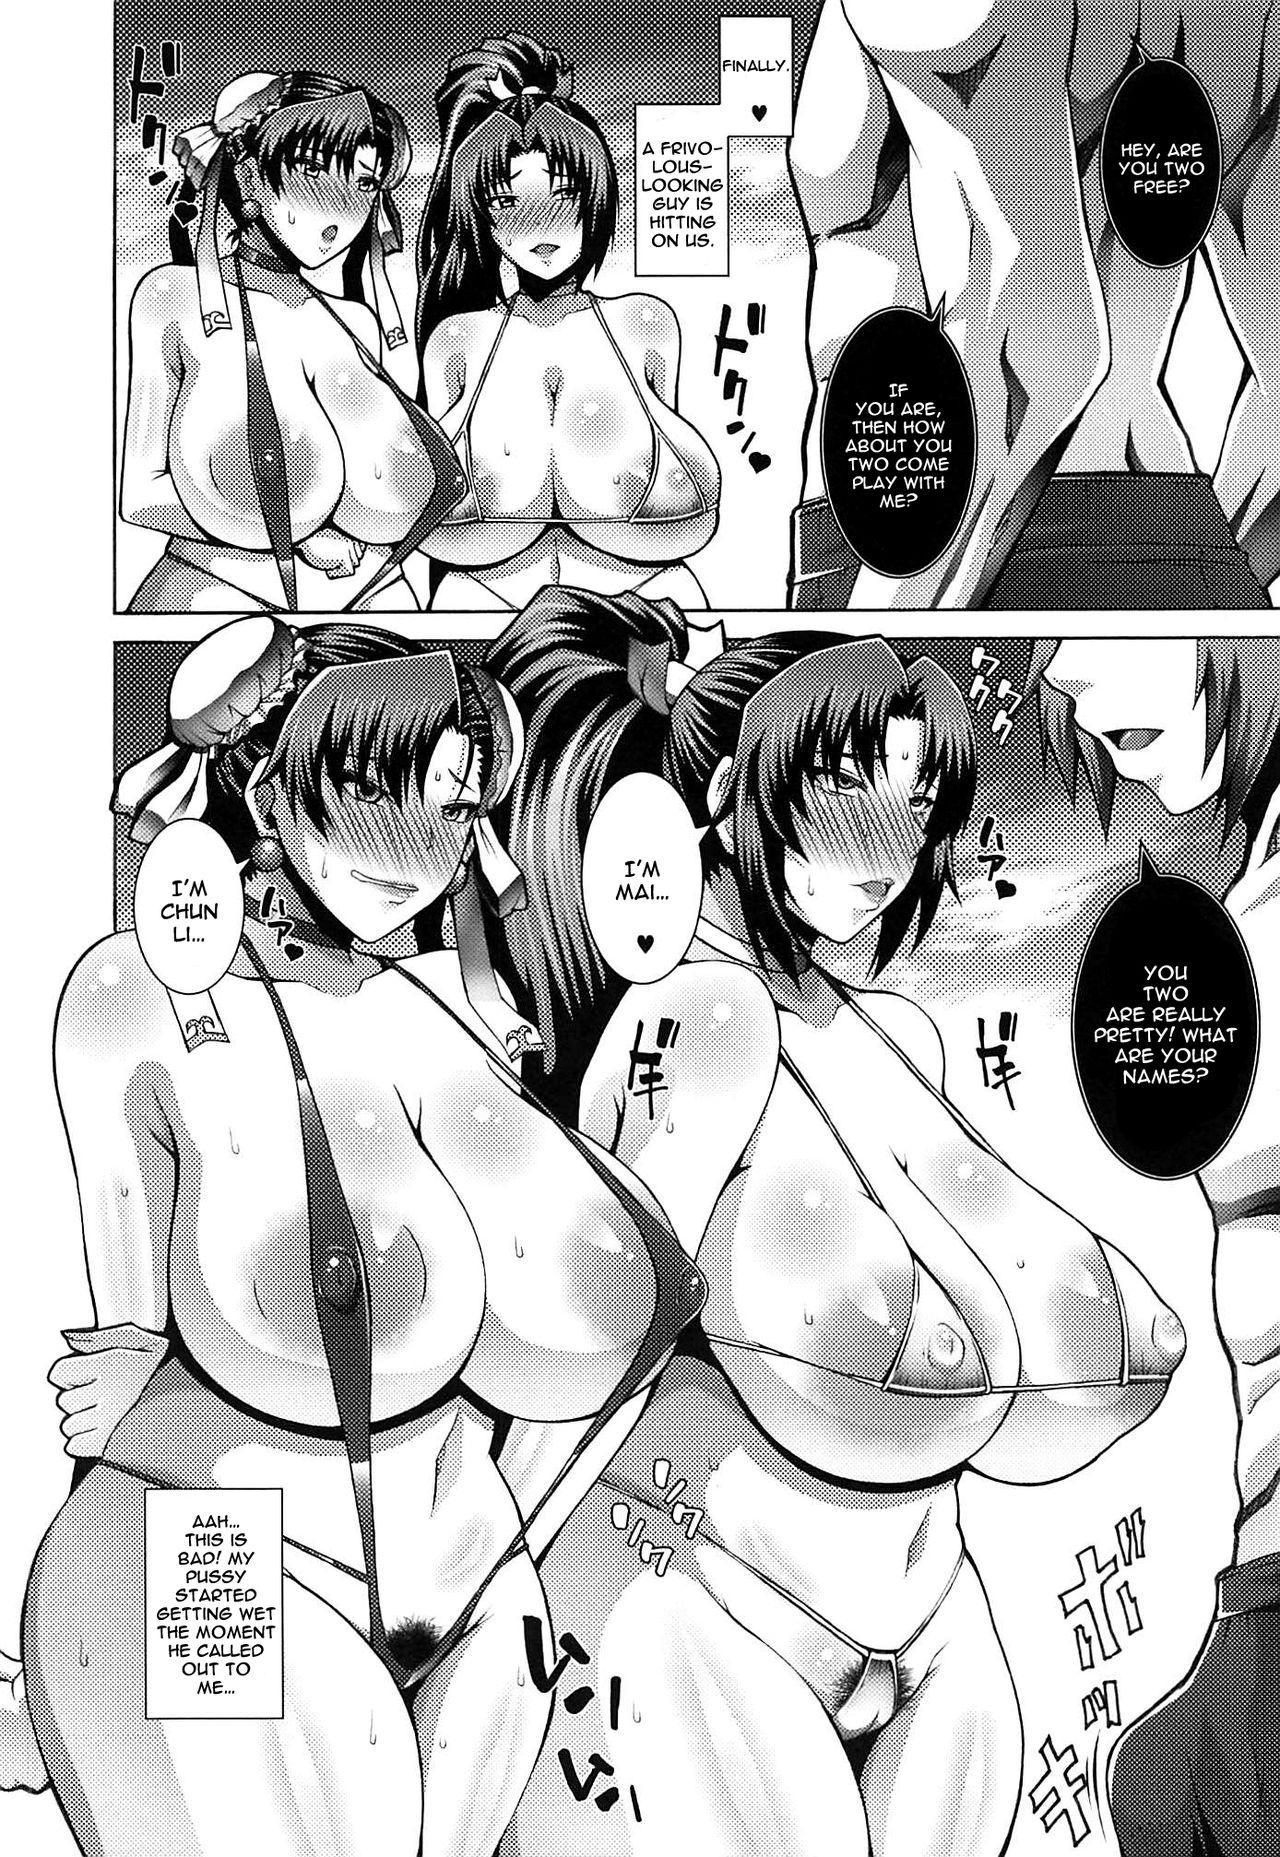 Nipponichi no Dosukebe Onna ga Charao ni Nanpa Sarete Hotel ni Tsurekomareru Ohanashi   A Story About The Lewdest Women In Japan Getting Picked Up And Taken Back To a Hotel 4